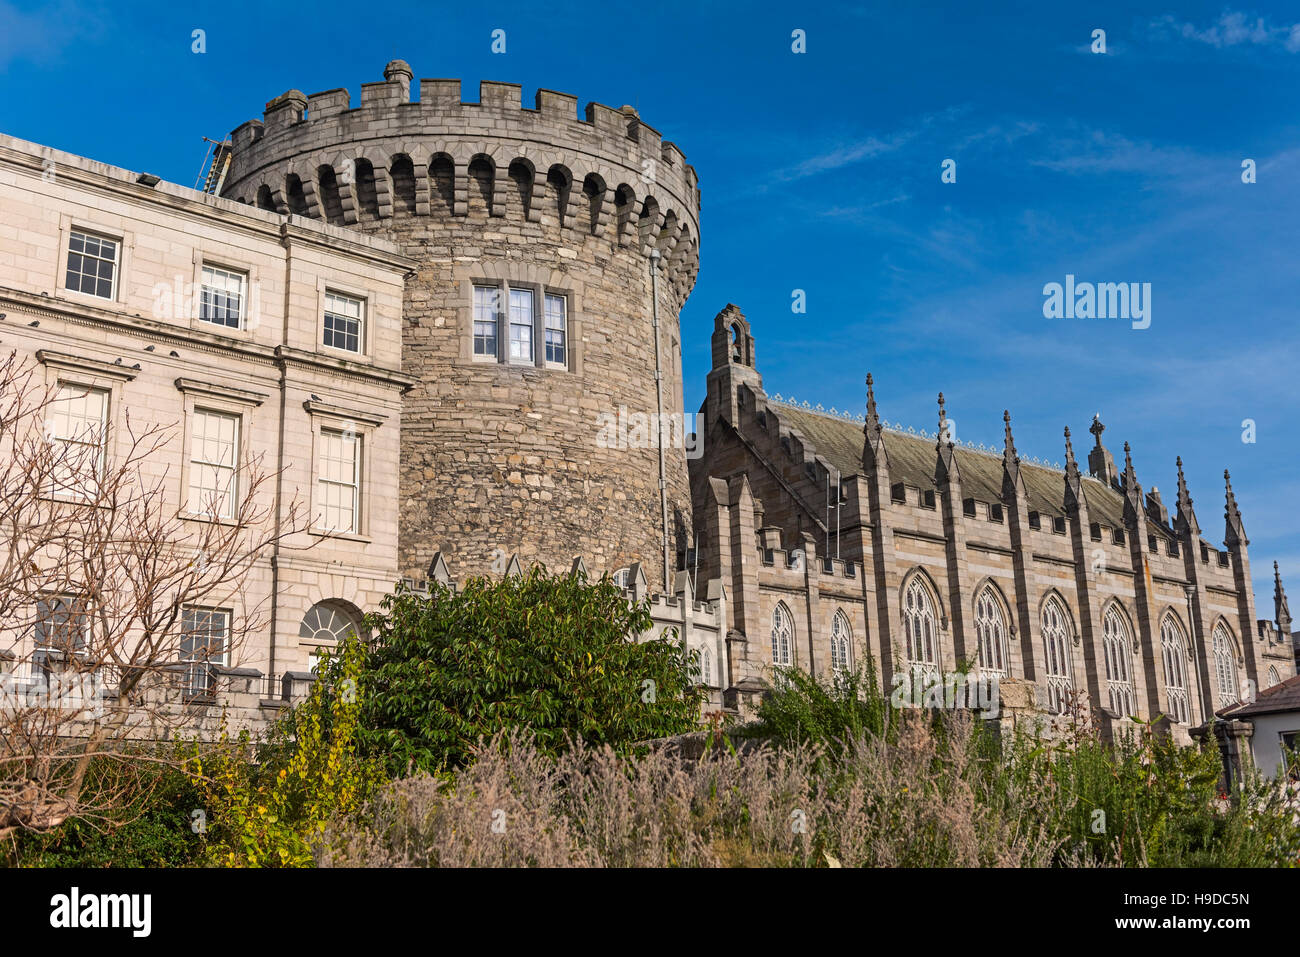 Dublin Castle Record Tower Dublin Ireland - Stock Image